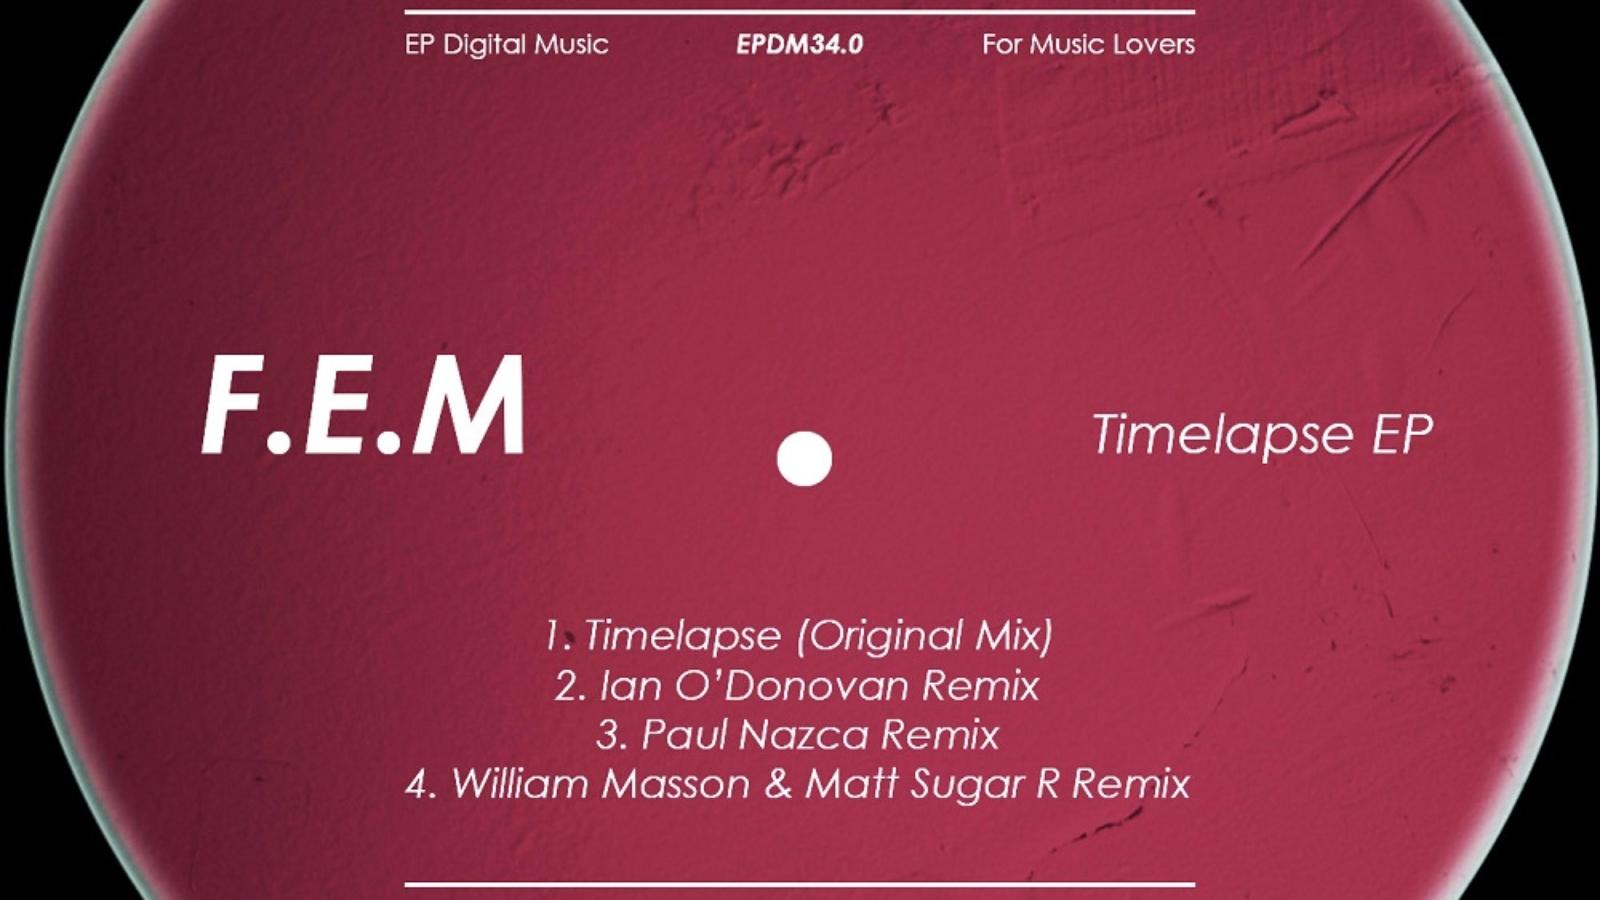 EP_Digital_Music_34.0_Cover